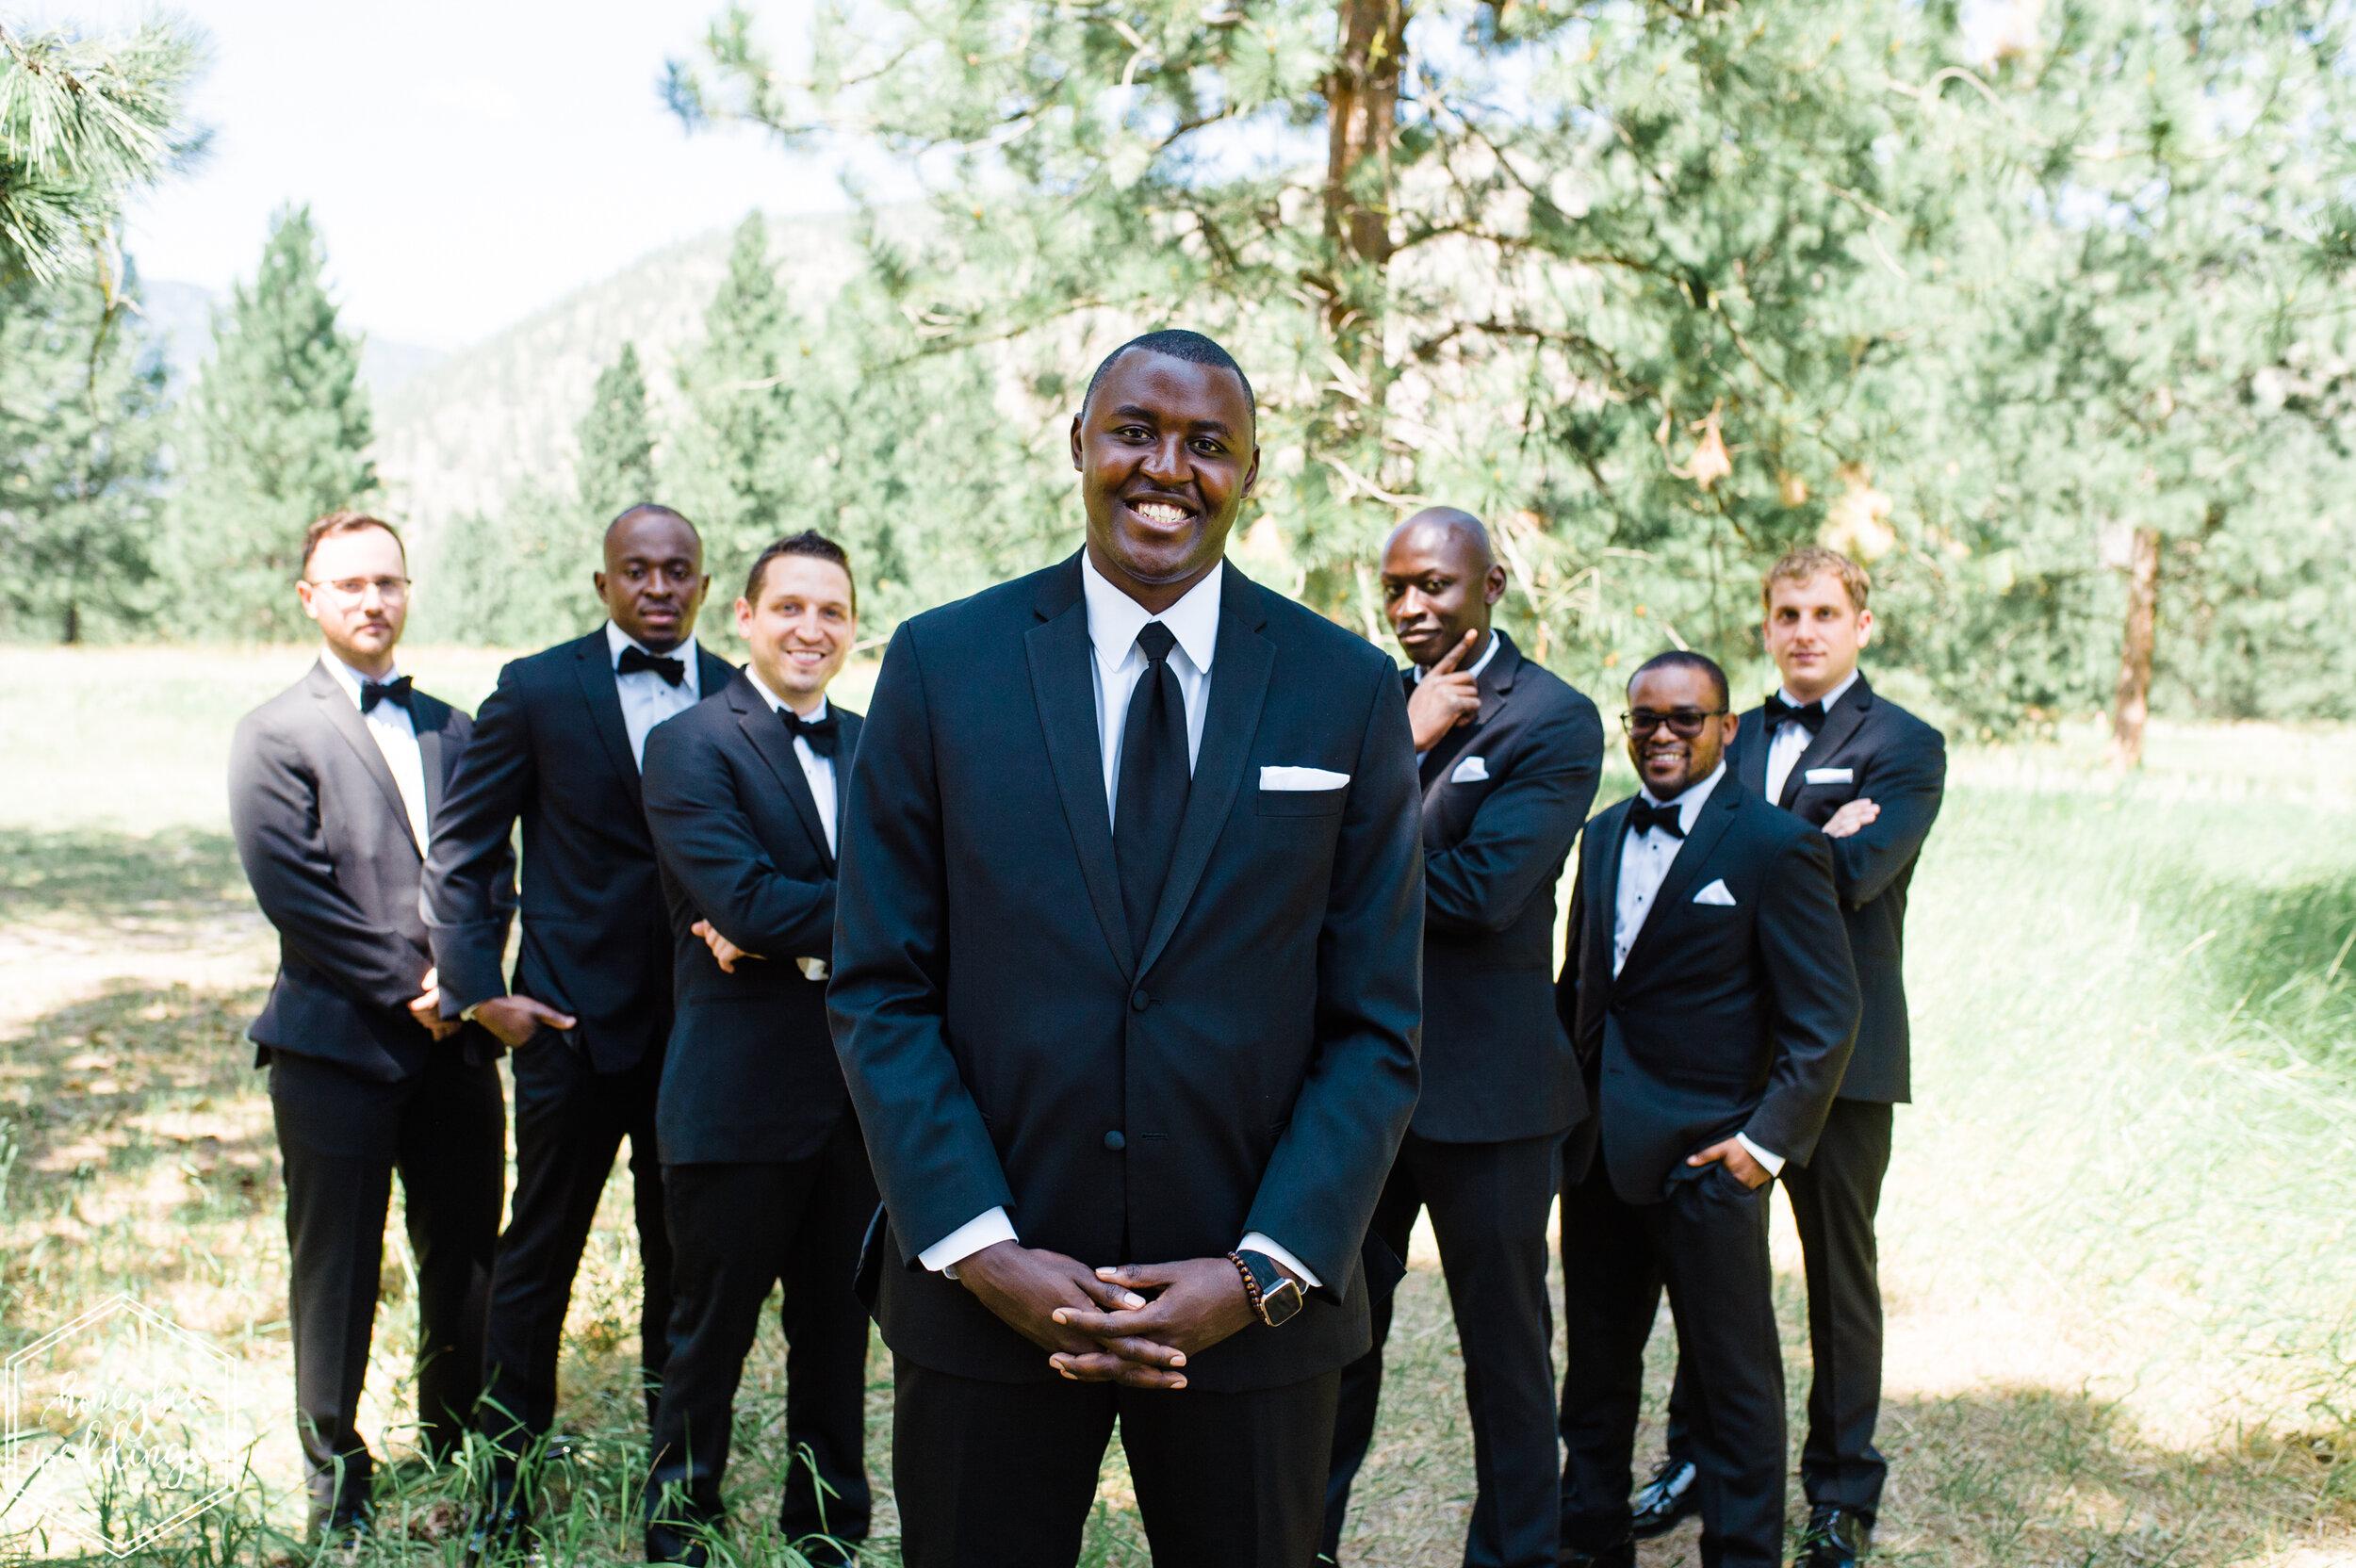 015White Raven Wedding_Montana Wedding Photographer_Rebekah & Likom_Honeybee Weddings_July 27, 2019-1646.jpg